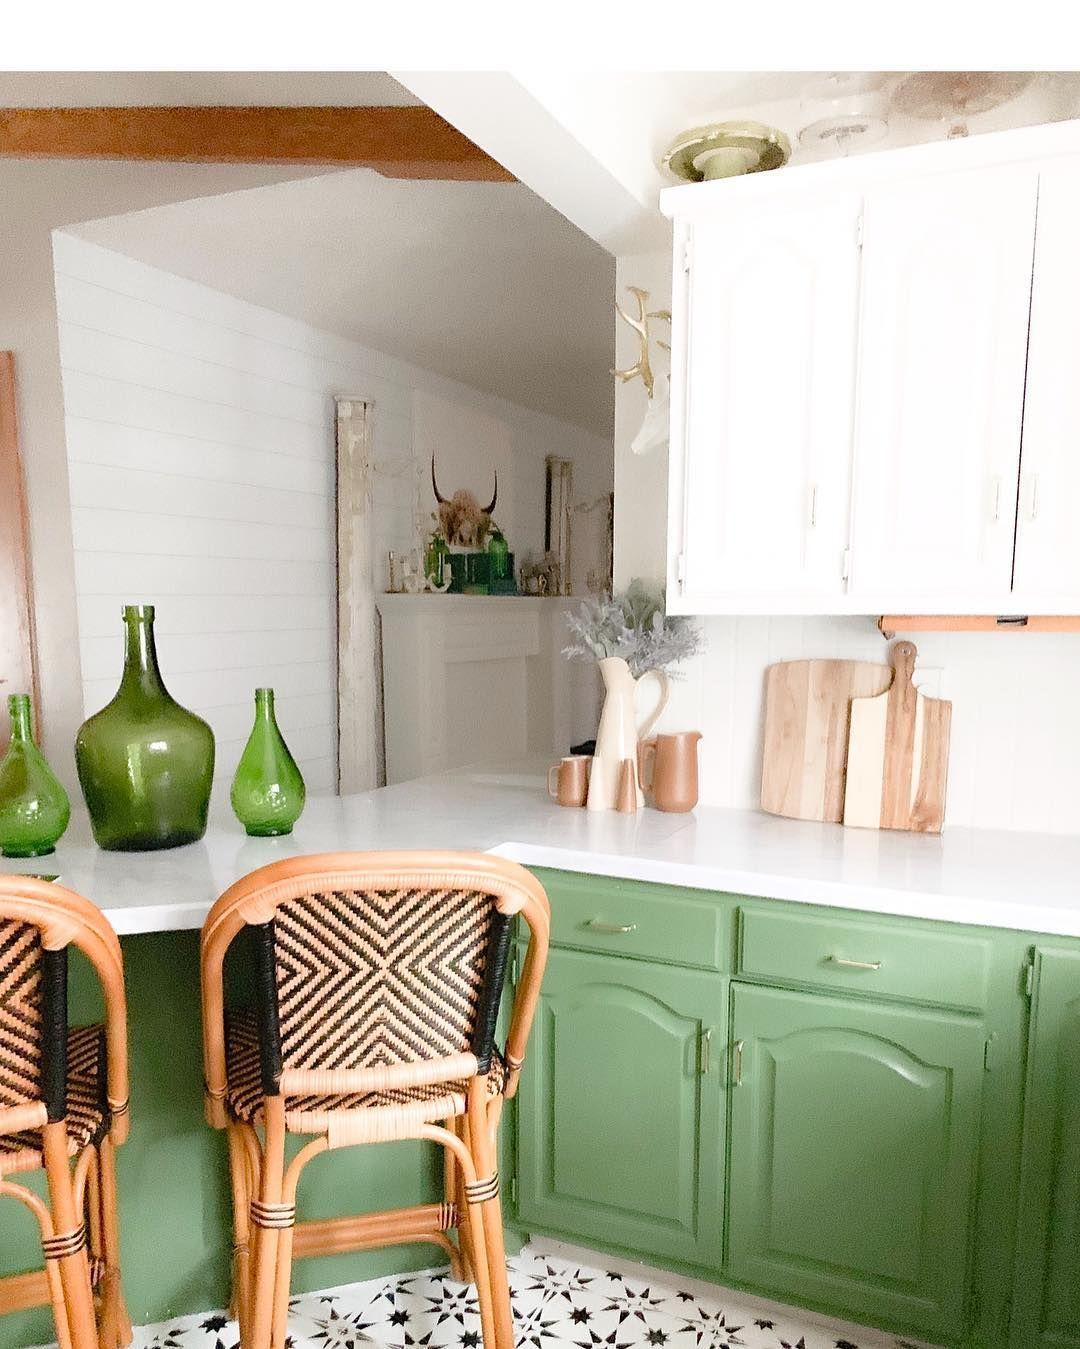 25 lively green kitchen design ideas green kitchen cabinets kitchen design green kitchen on kitchen interior green id=69224